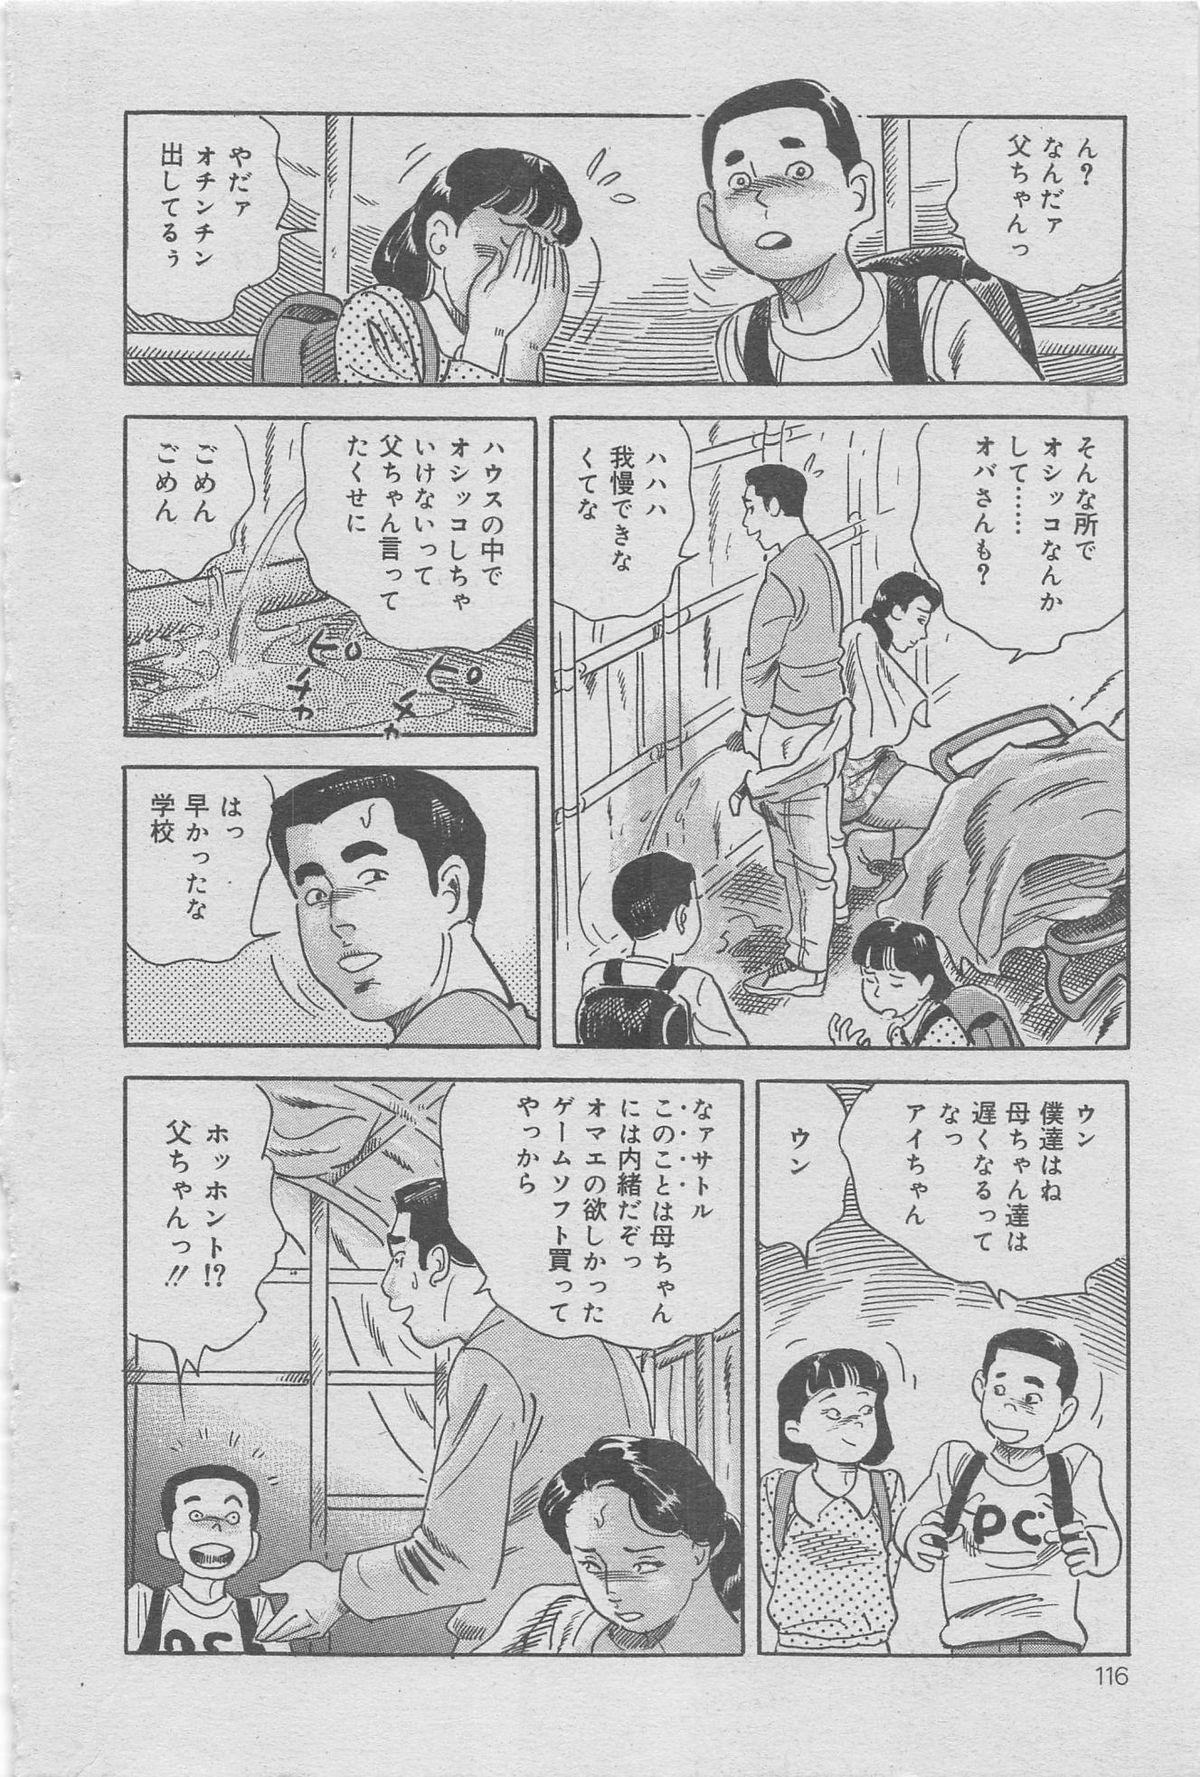 Hontou ni Atta Kindanai vol.7 91